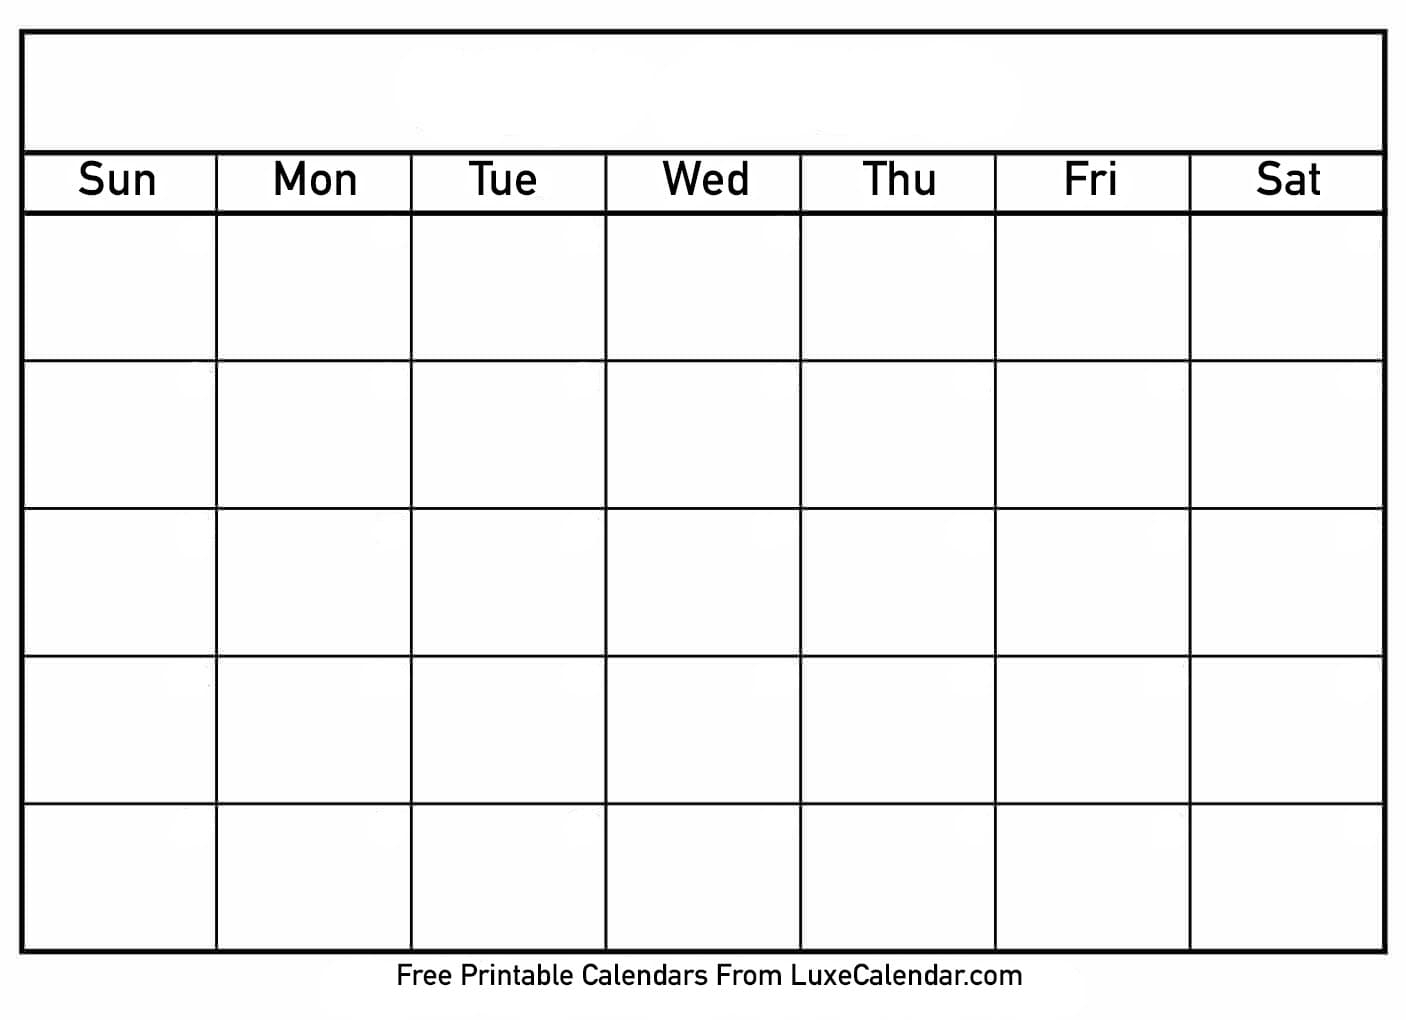 Blank Printable Calendar - Luxe Calendar with Blank Calendar Template With Lines